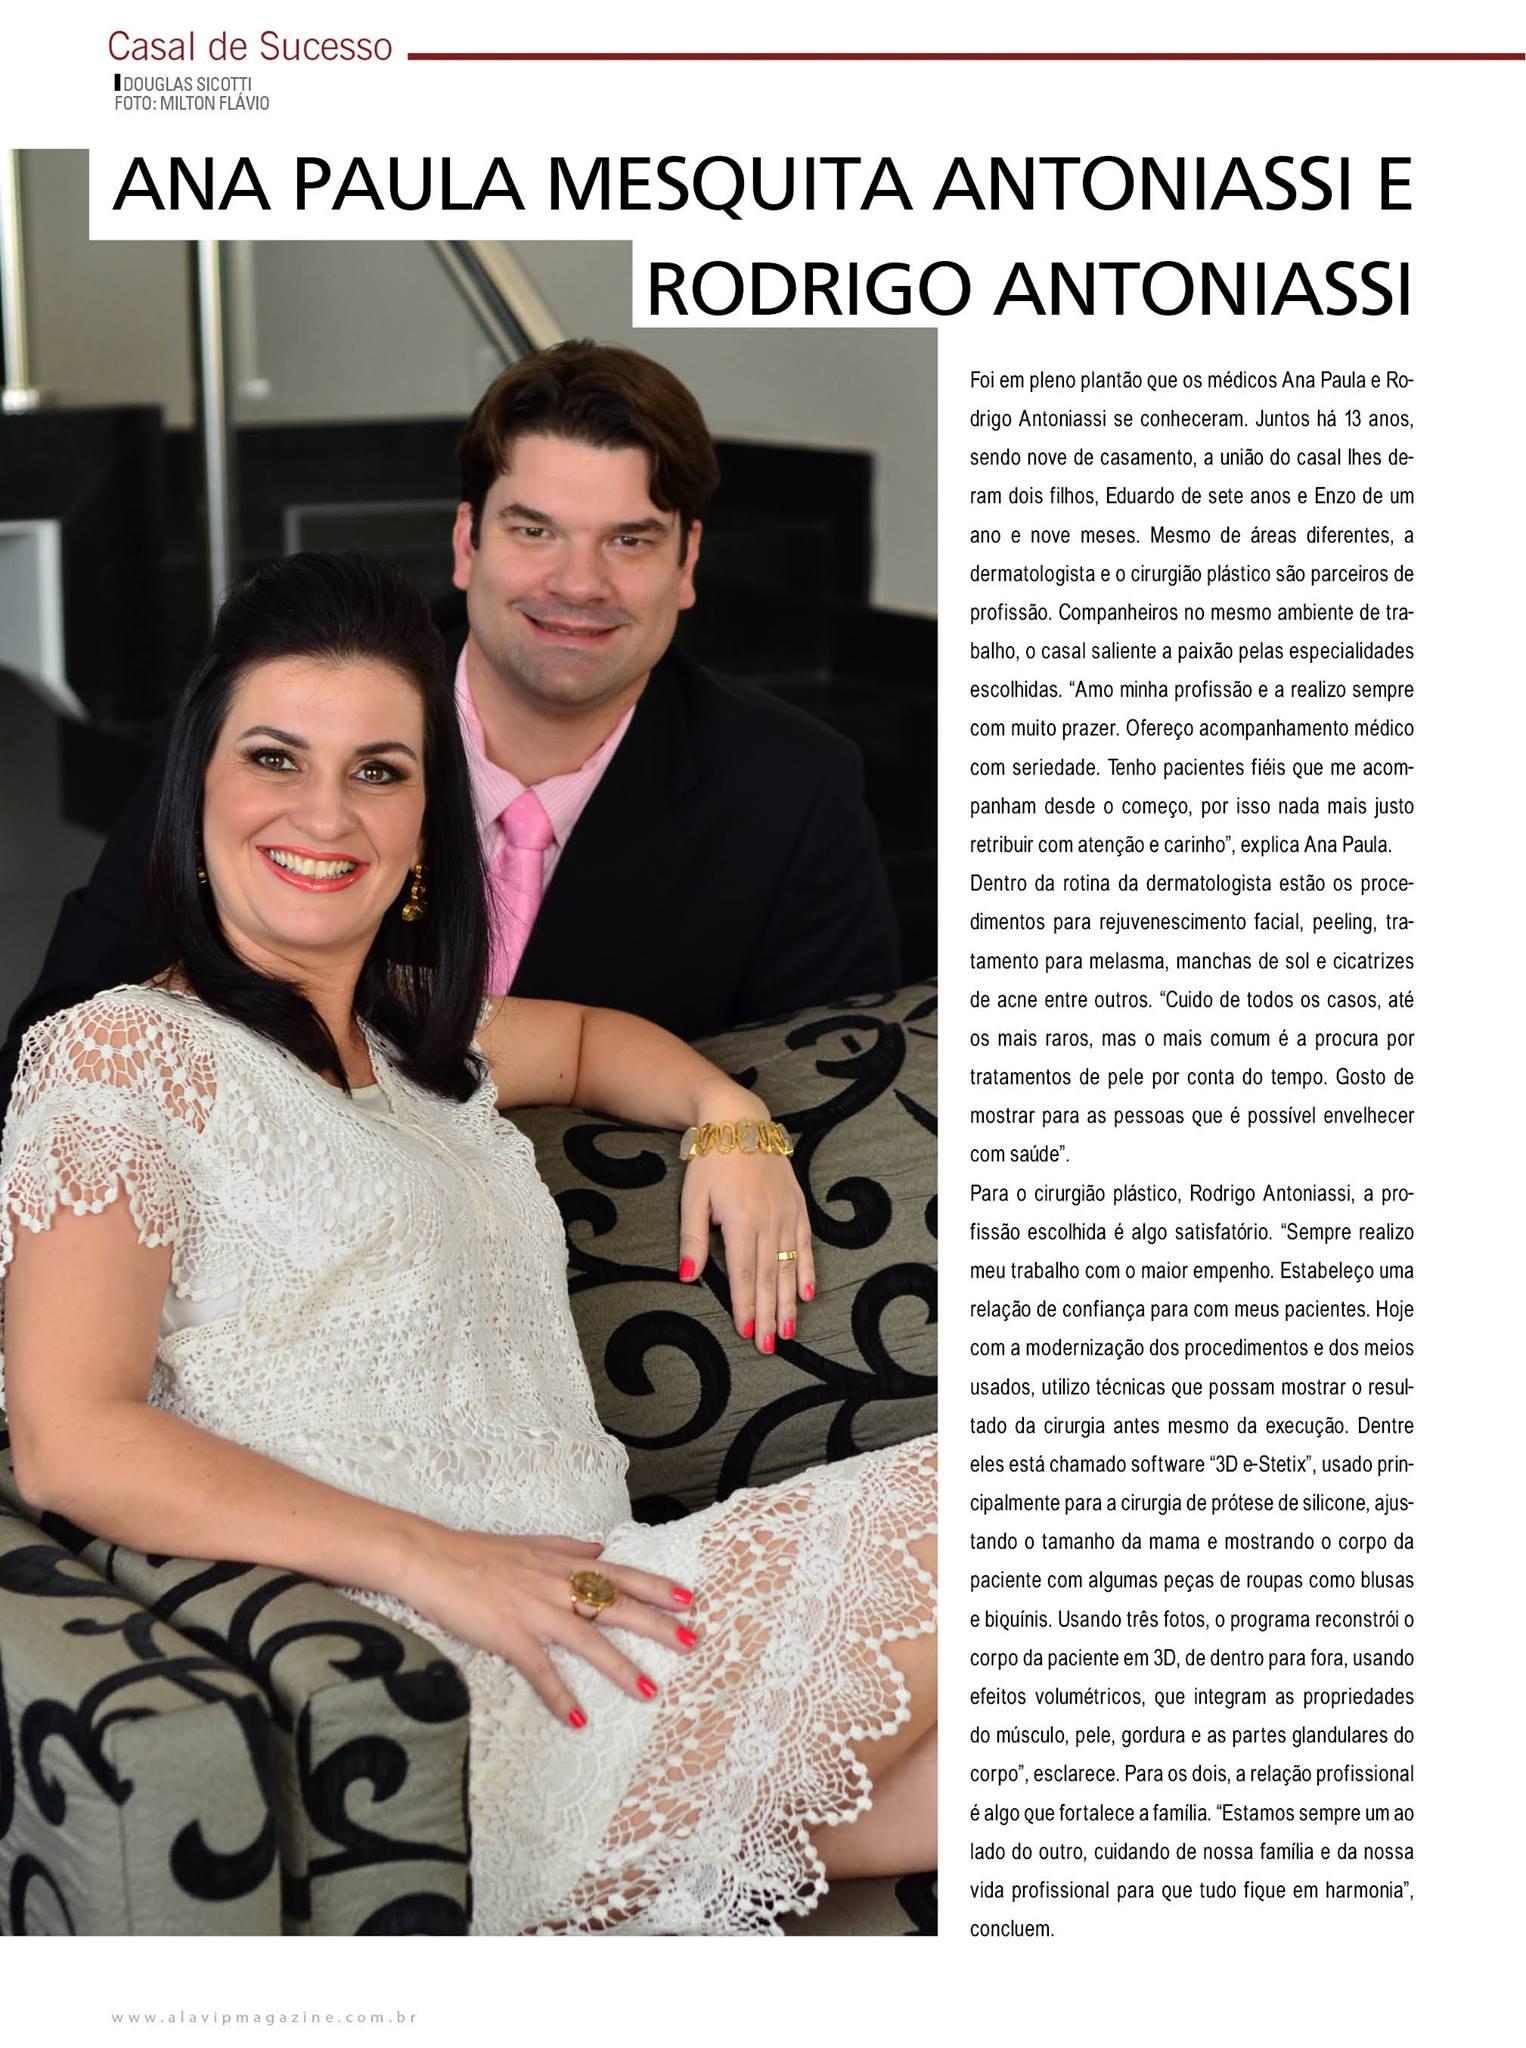 Revista Ala Vip - Julho 2013